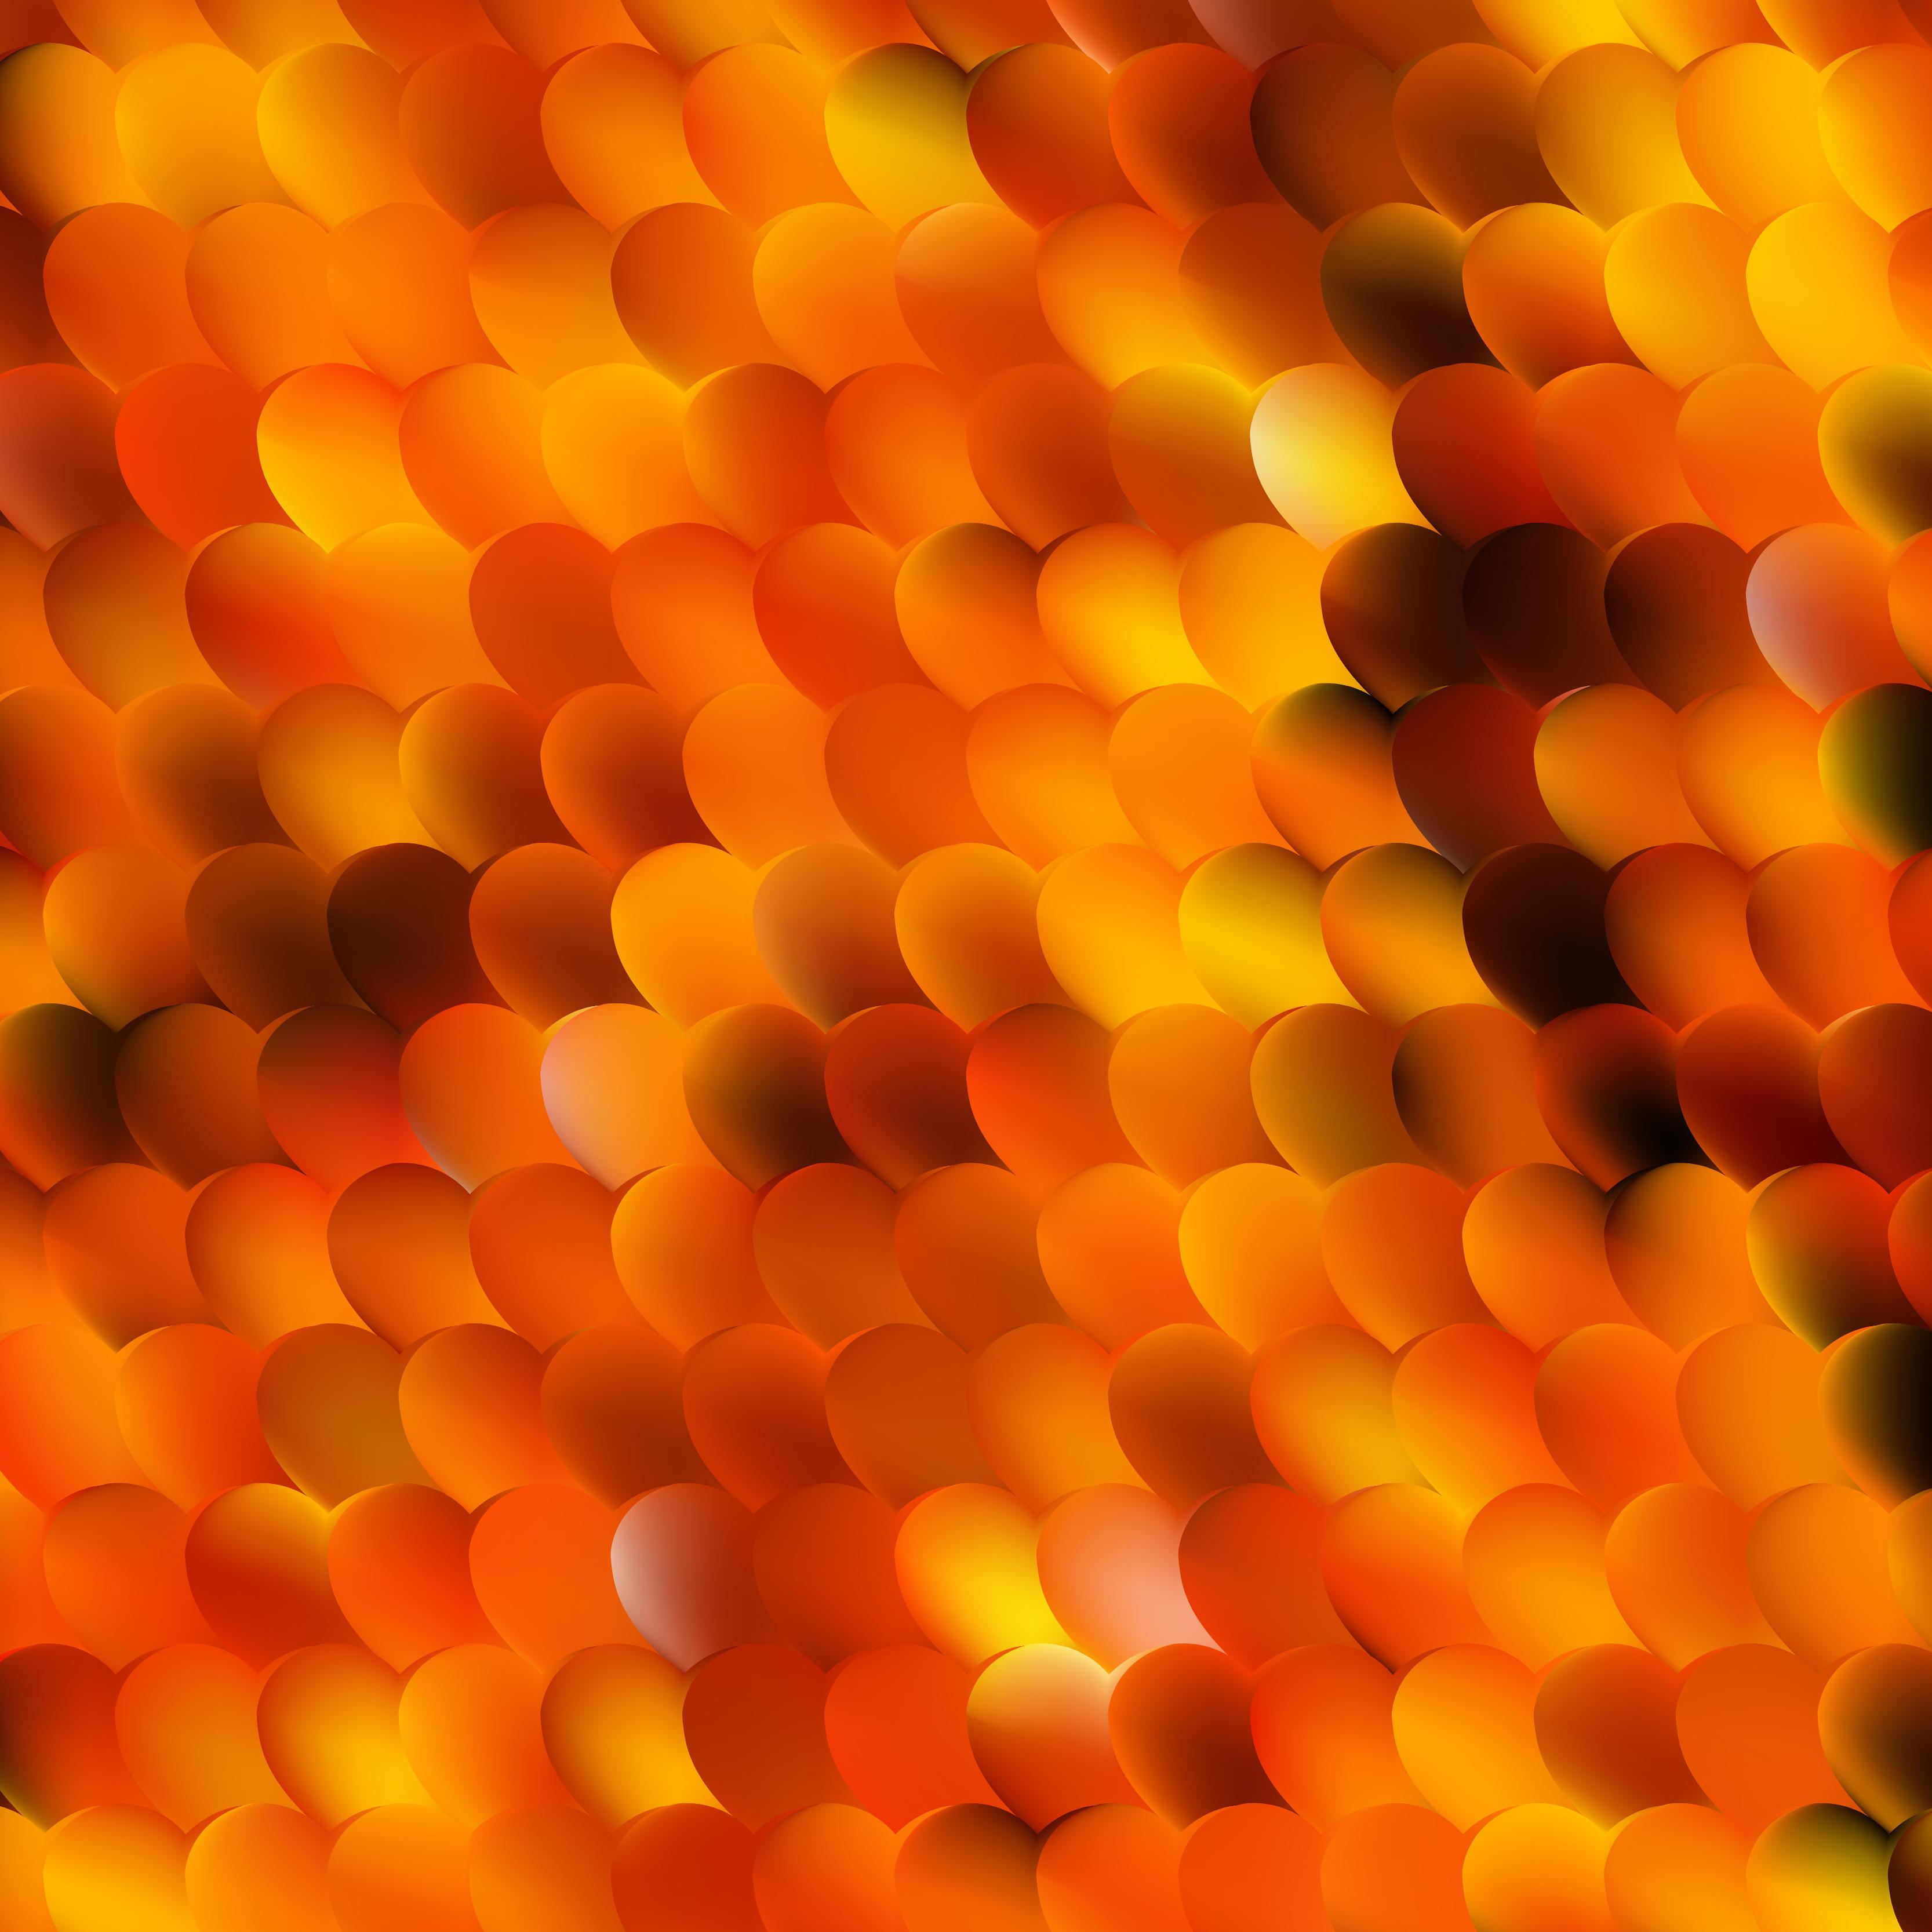 cool orange background